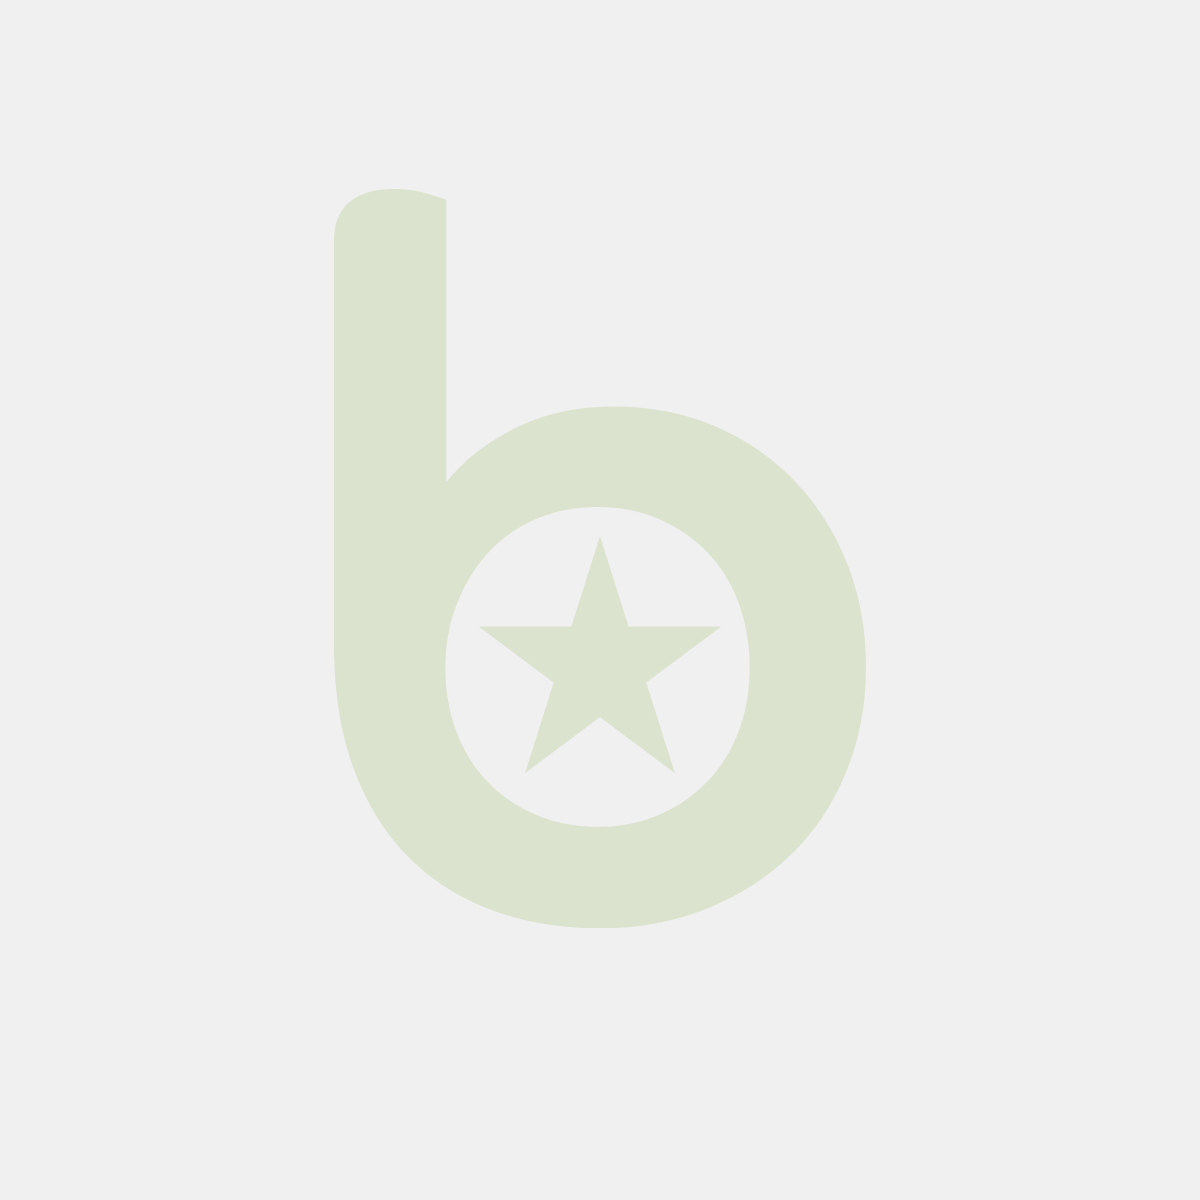 Bloczek samoprzylepny POST-IT® Super Sticky w linie (4690-SS3BGK-EU), 101x152mm, 3x90 kart., paleta Bangkok